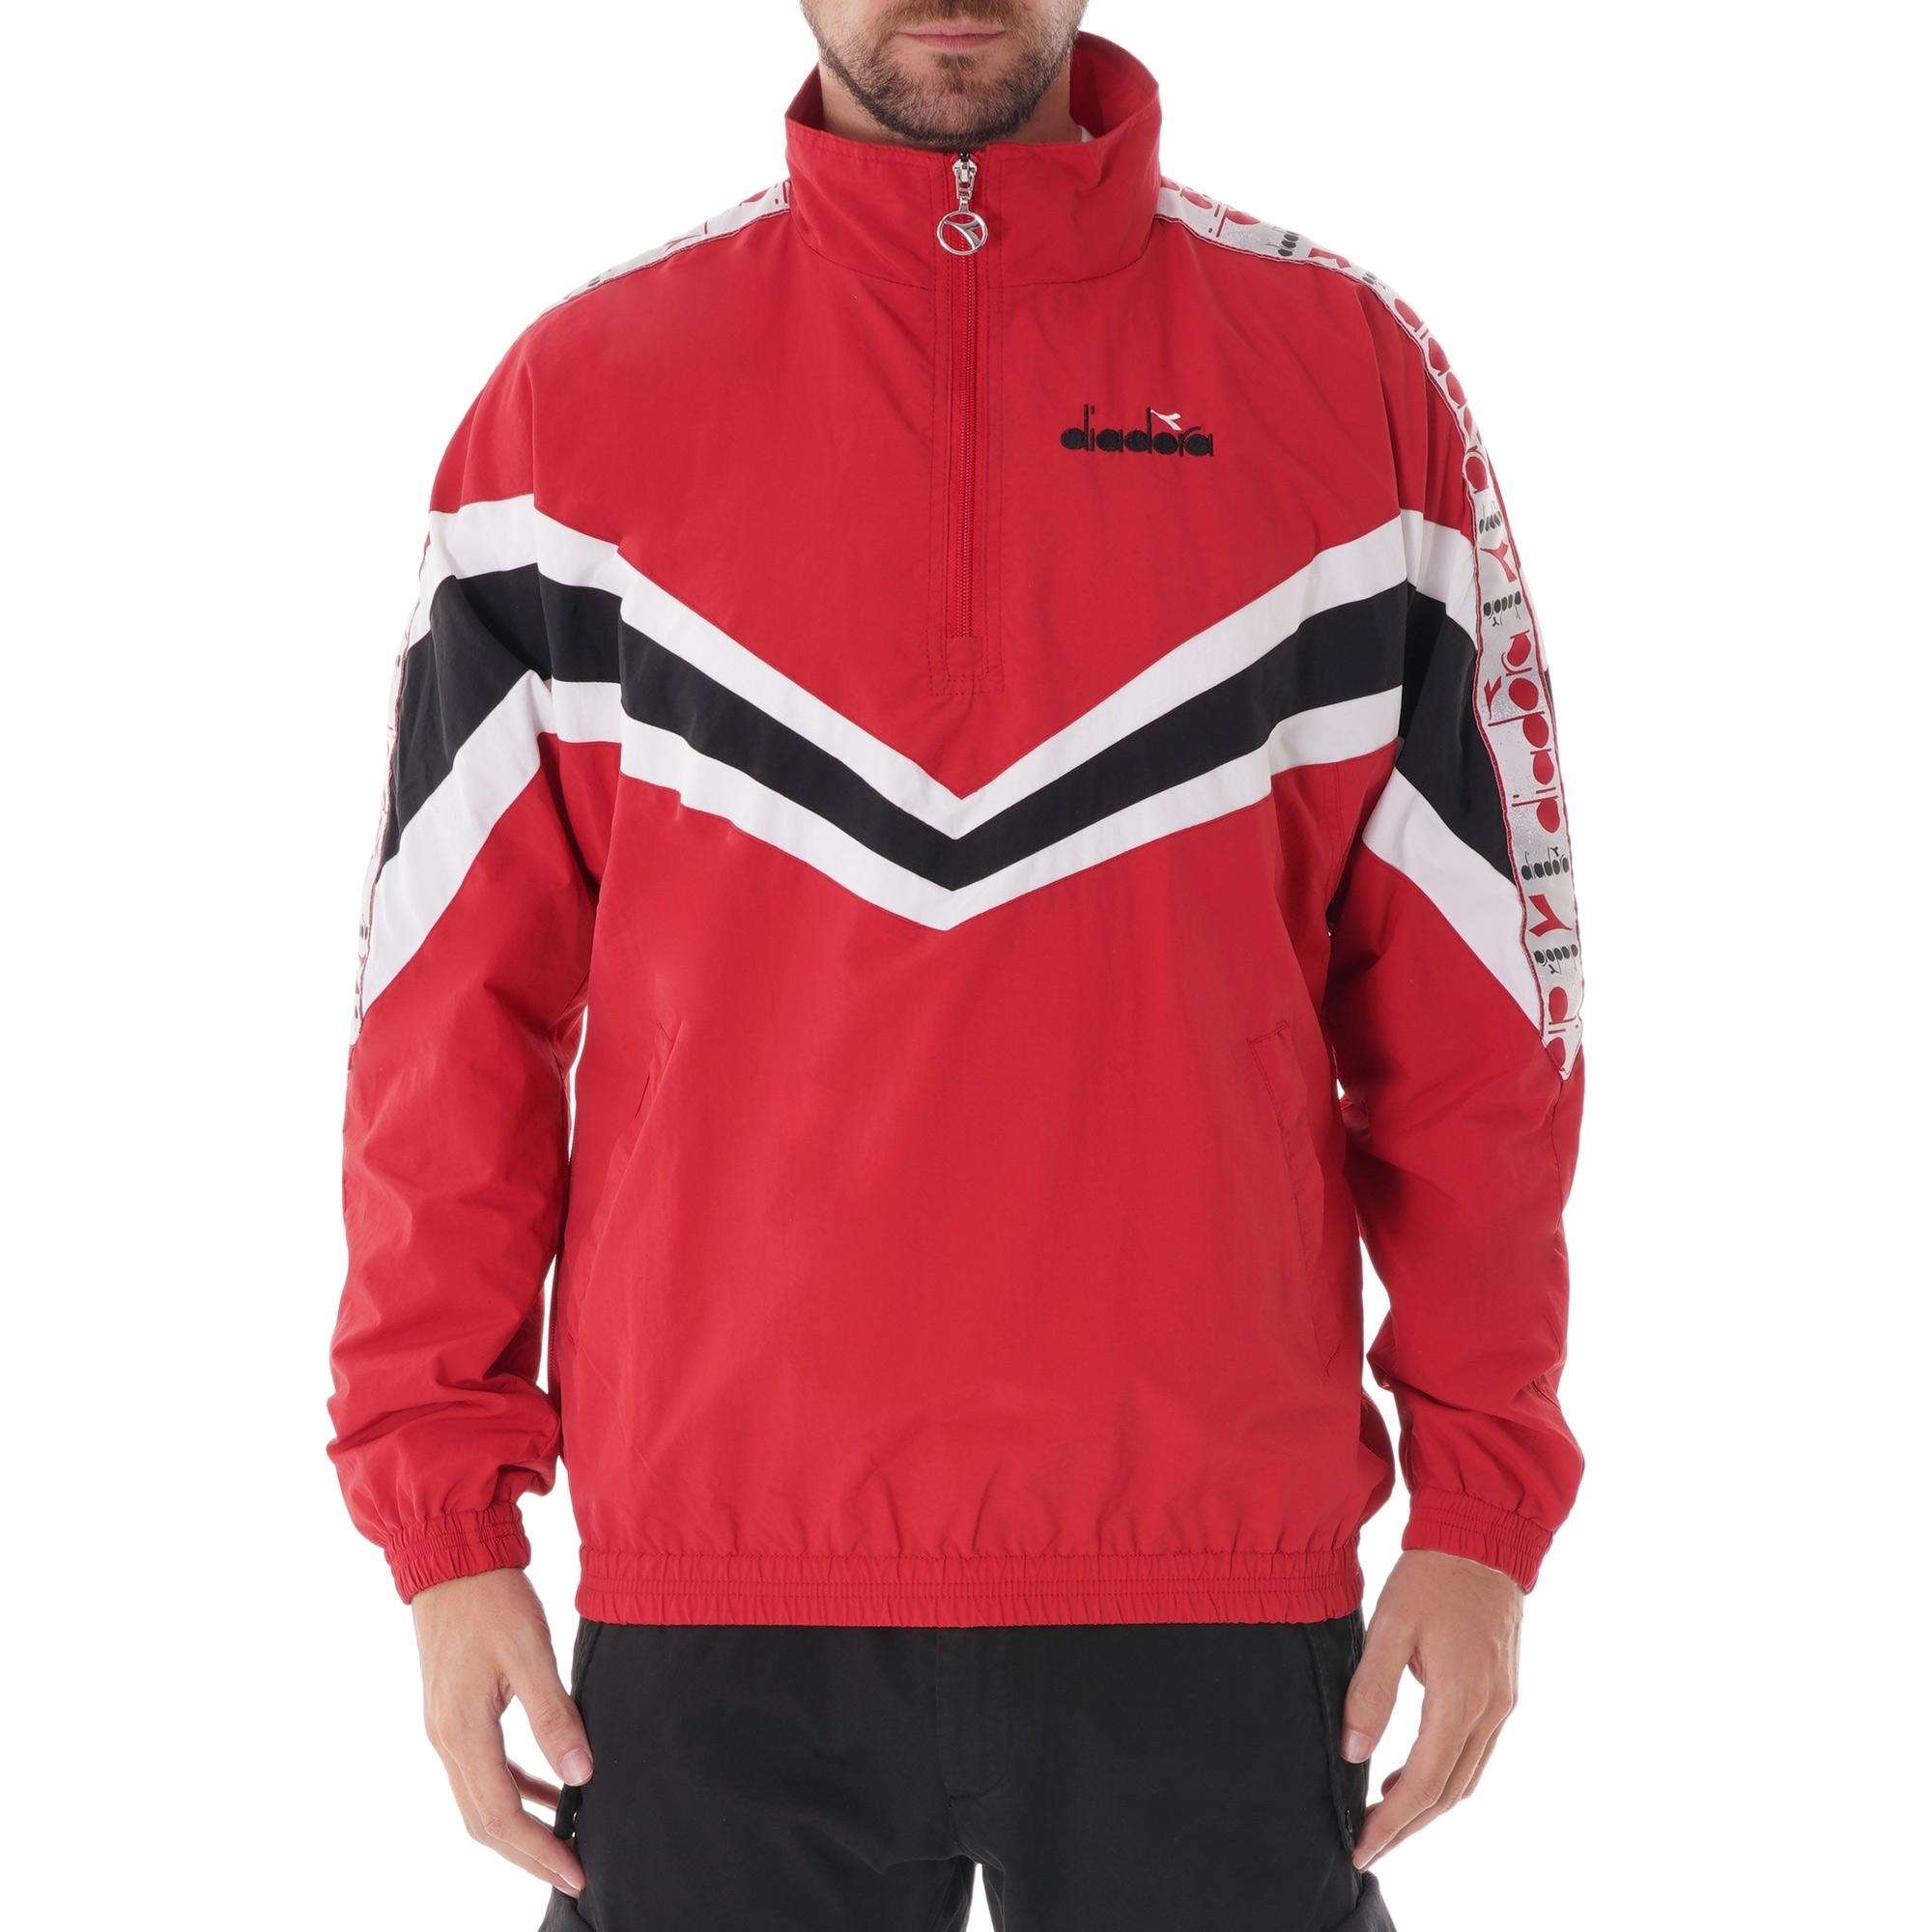 8e95bc12 Jacket 1/2 zip MVB - Red Capital